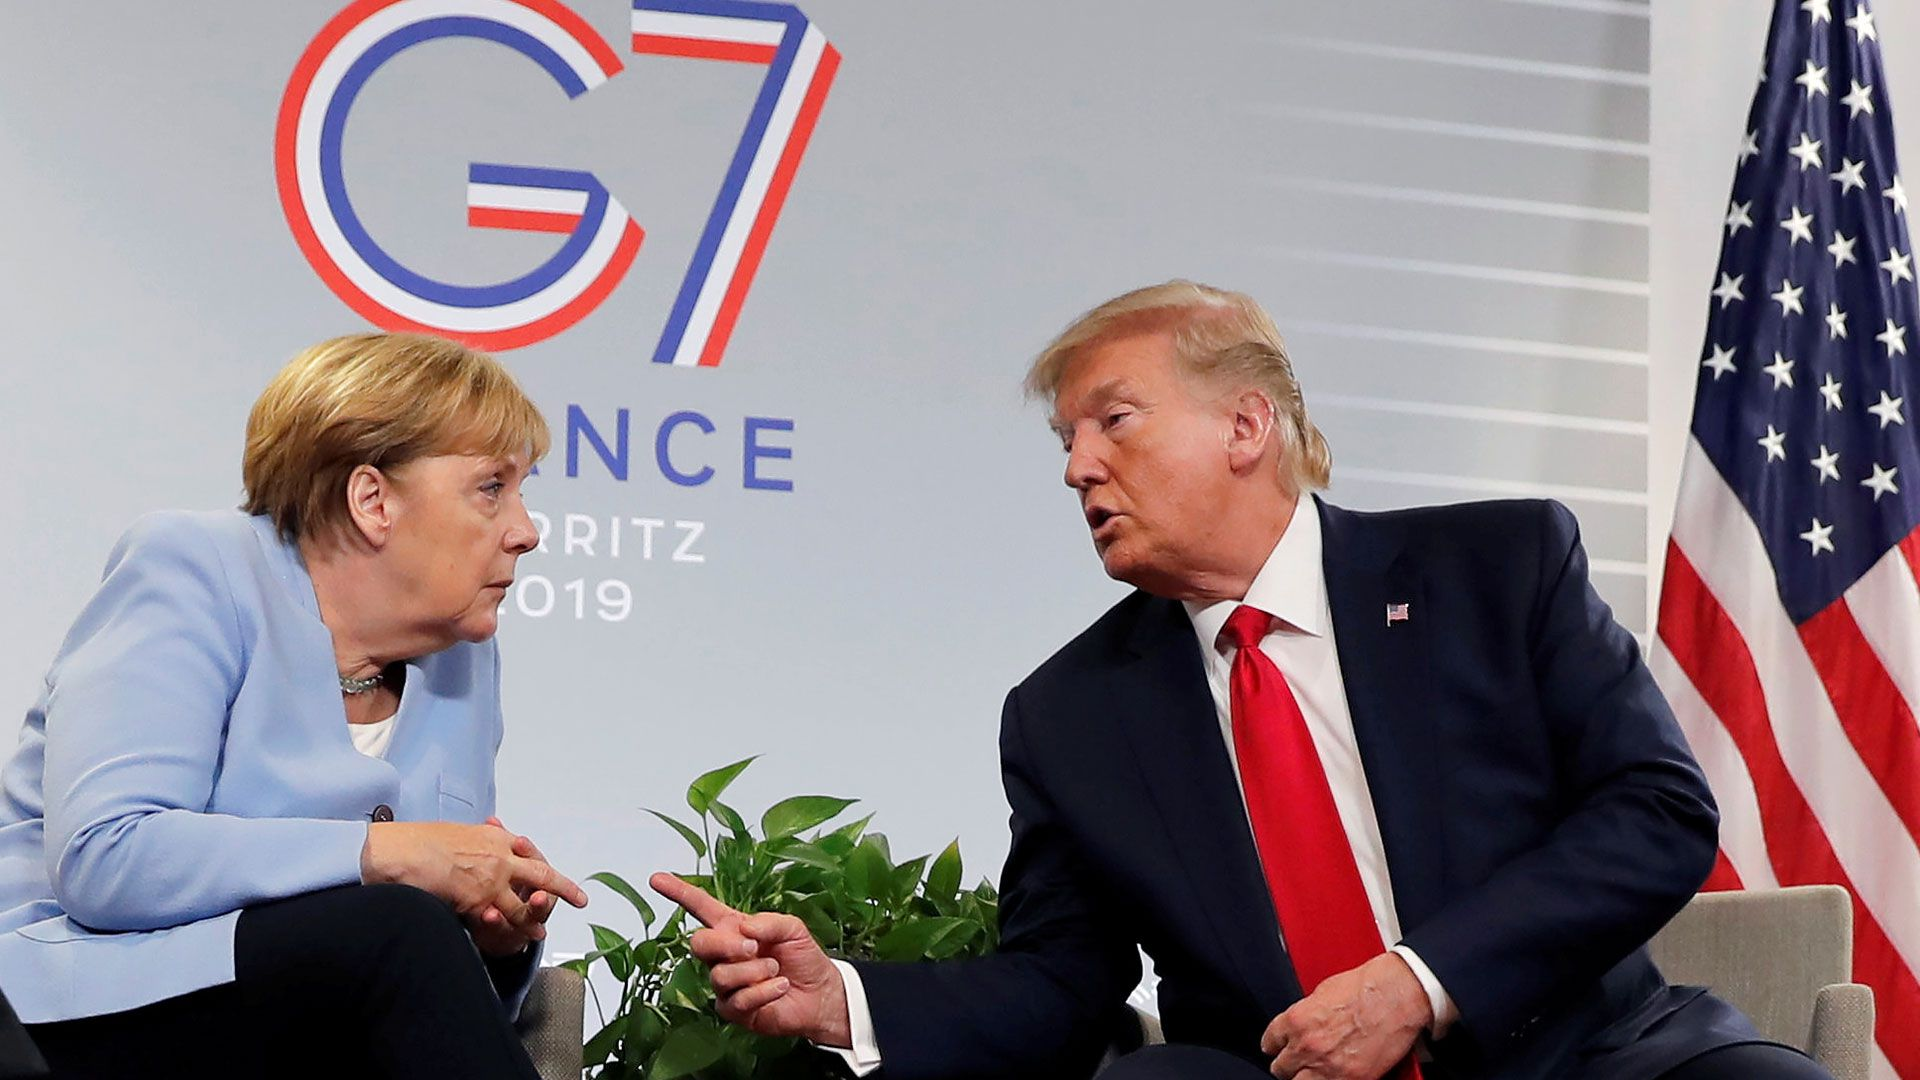 Angela Merkel, canciller de Alemania, junto a Trump (Reuters)